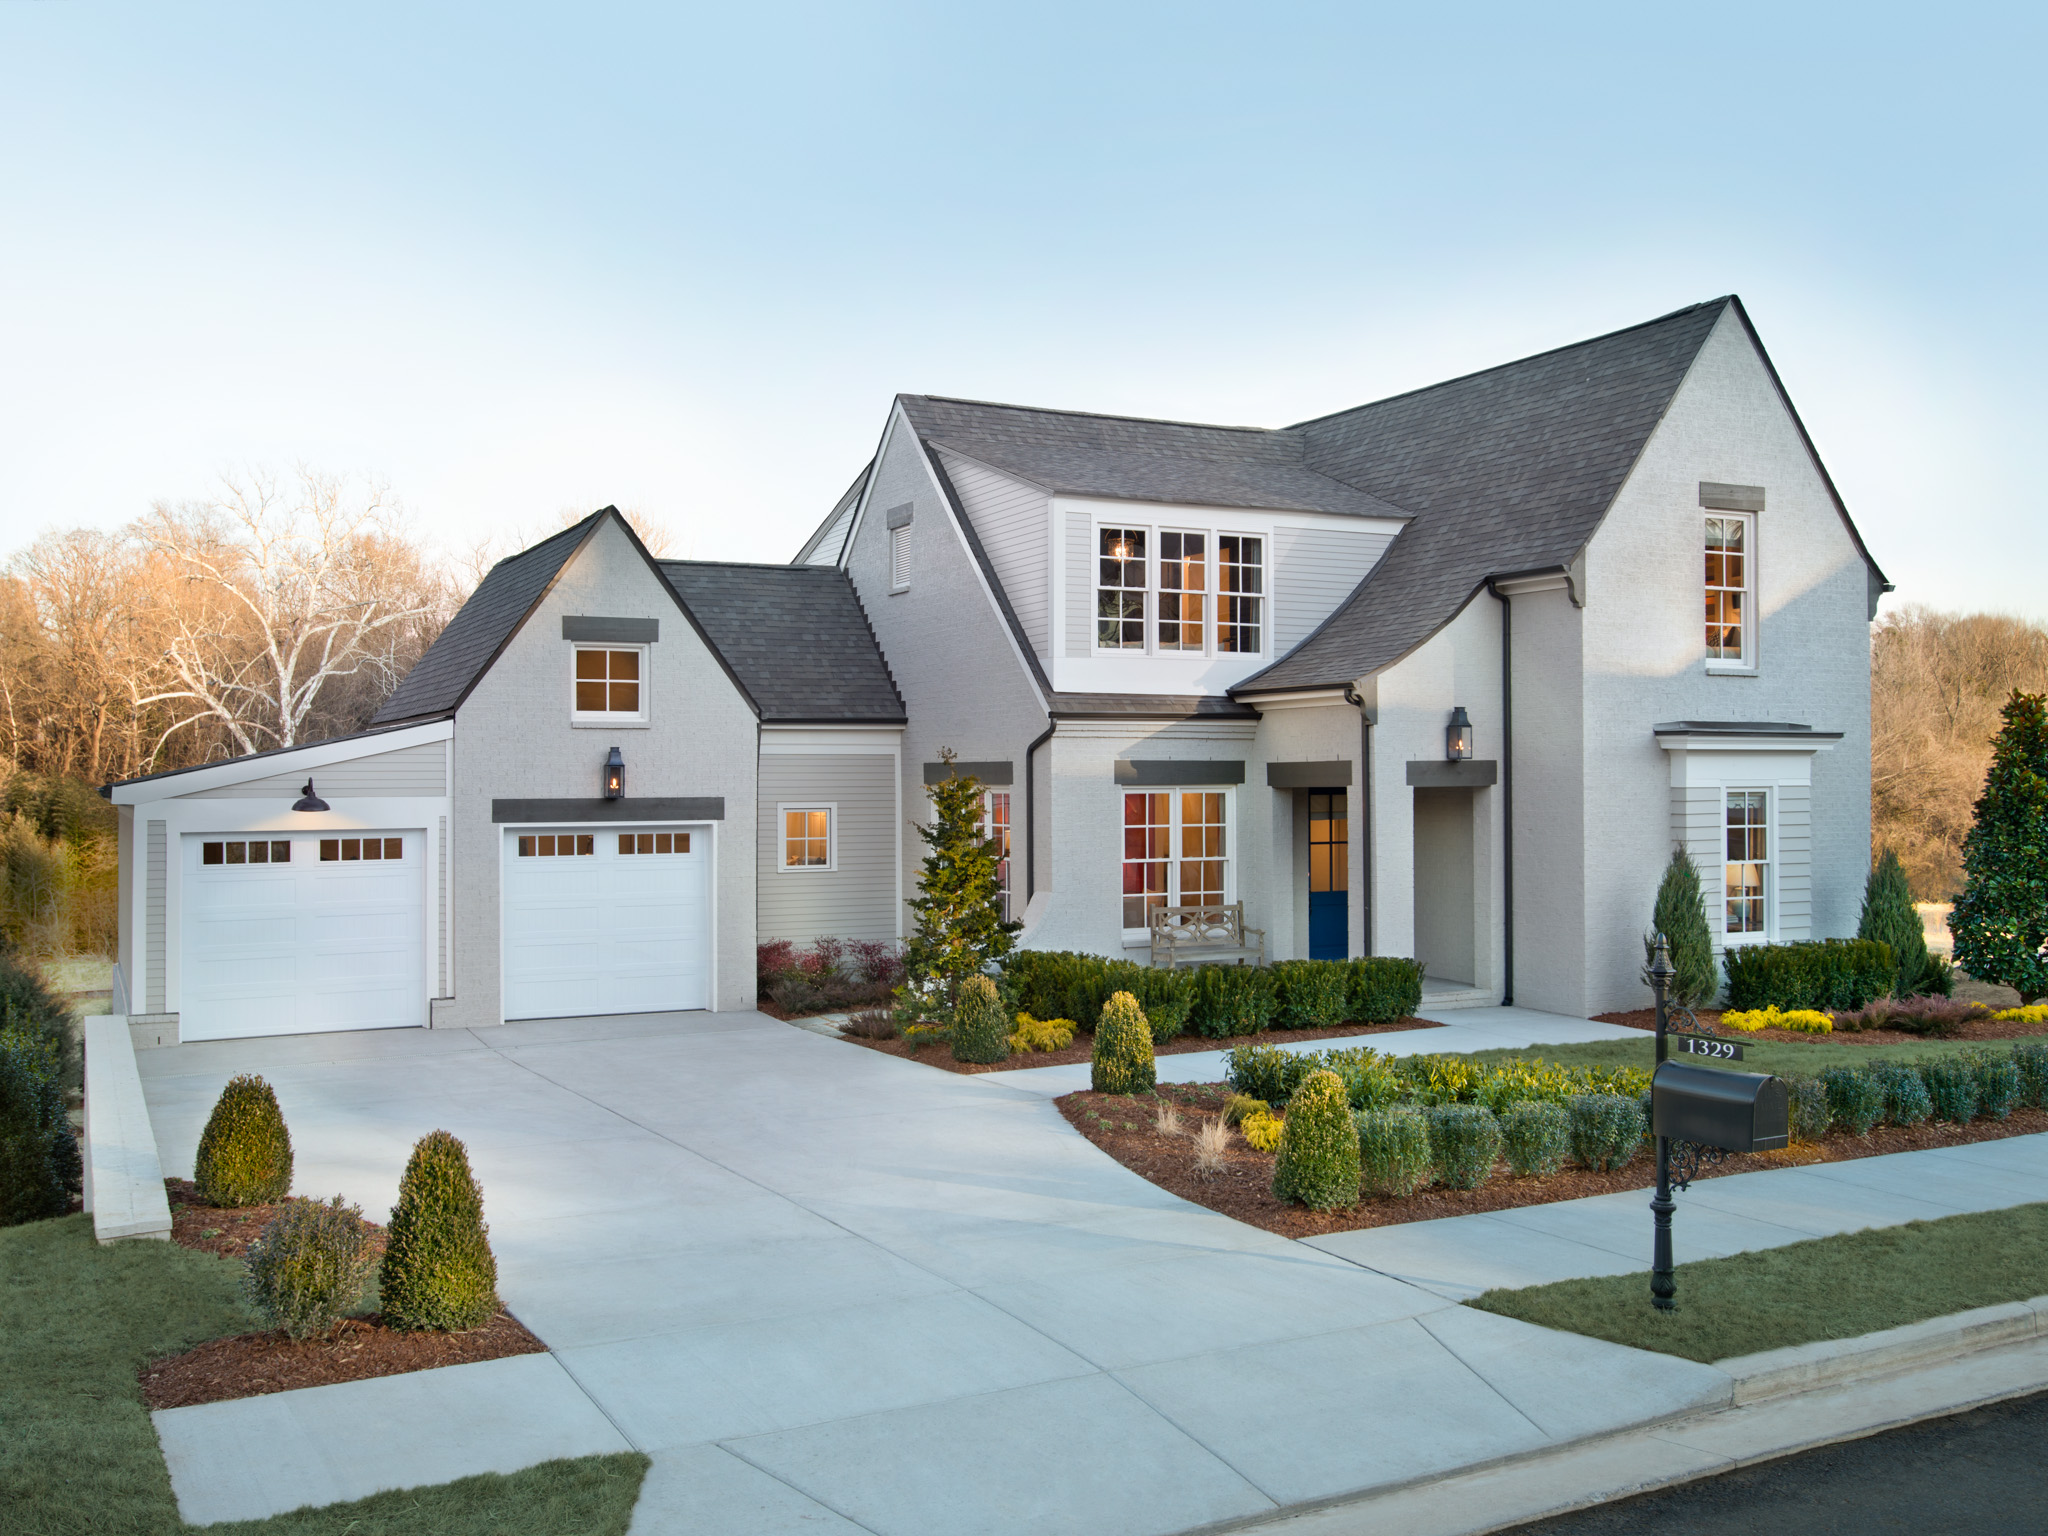 hgtv front door sweepstakesGarden Design Garden Design with Home Gardens Hgtv Dream Home